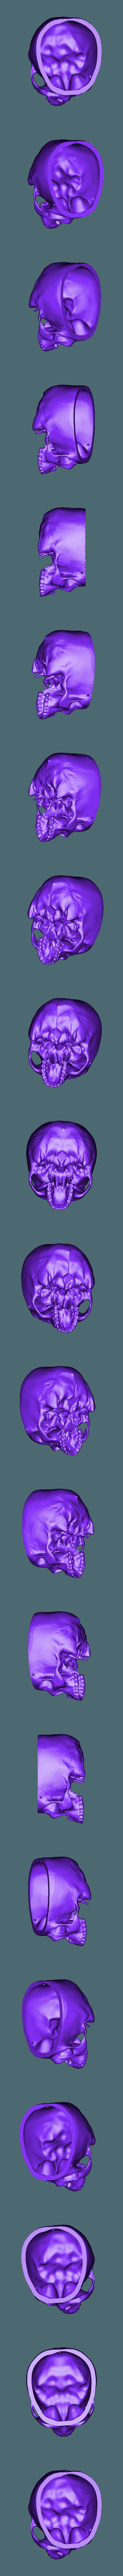 skullhangingplanter.stl Download free STL file Skull Bowl Remix into Skull Hanging Planter / Pot • 3D print design, ranibizumab